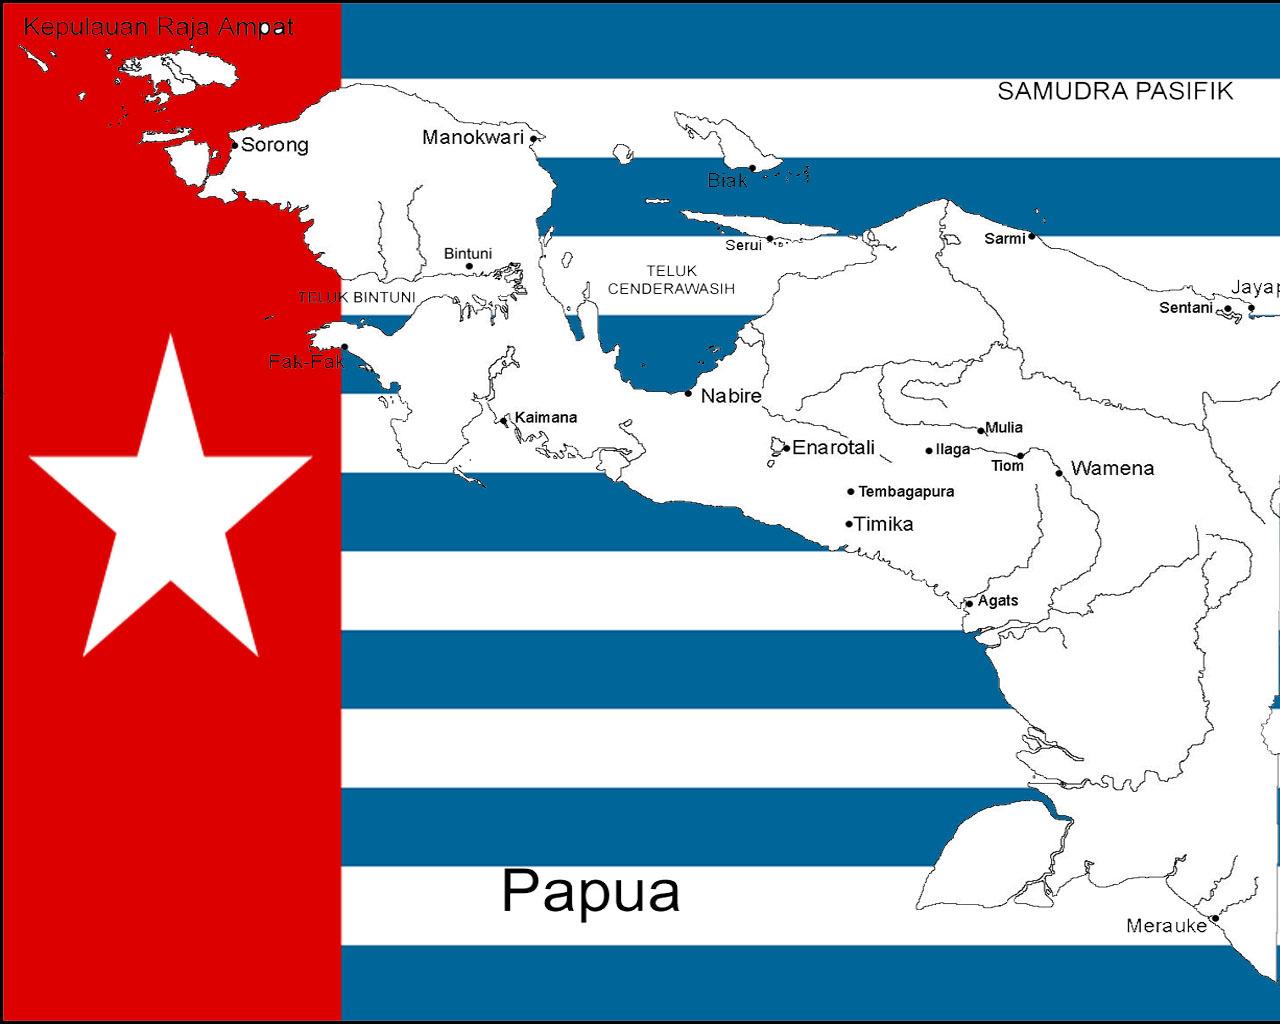 Political dynamics of colonization in West Papua | PAPUA MERDEKA ATAS DASAR KEADILAN